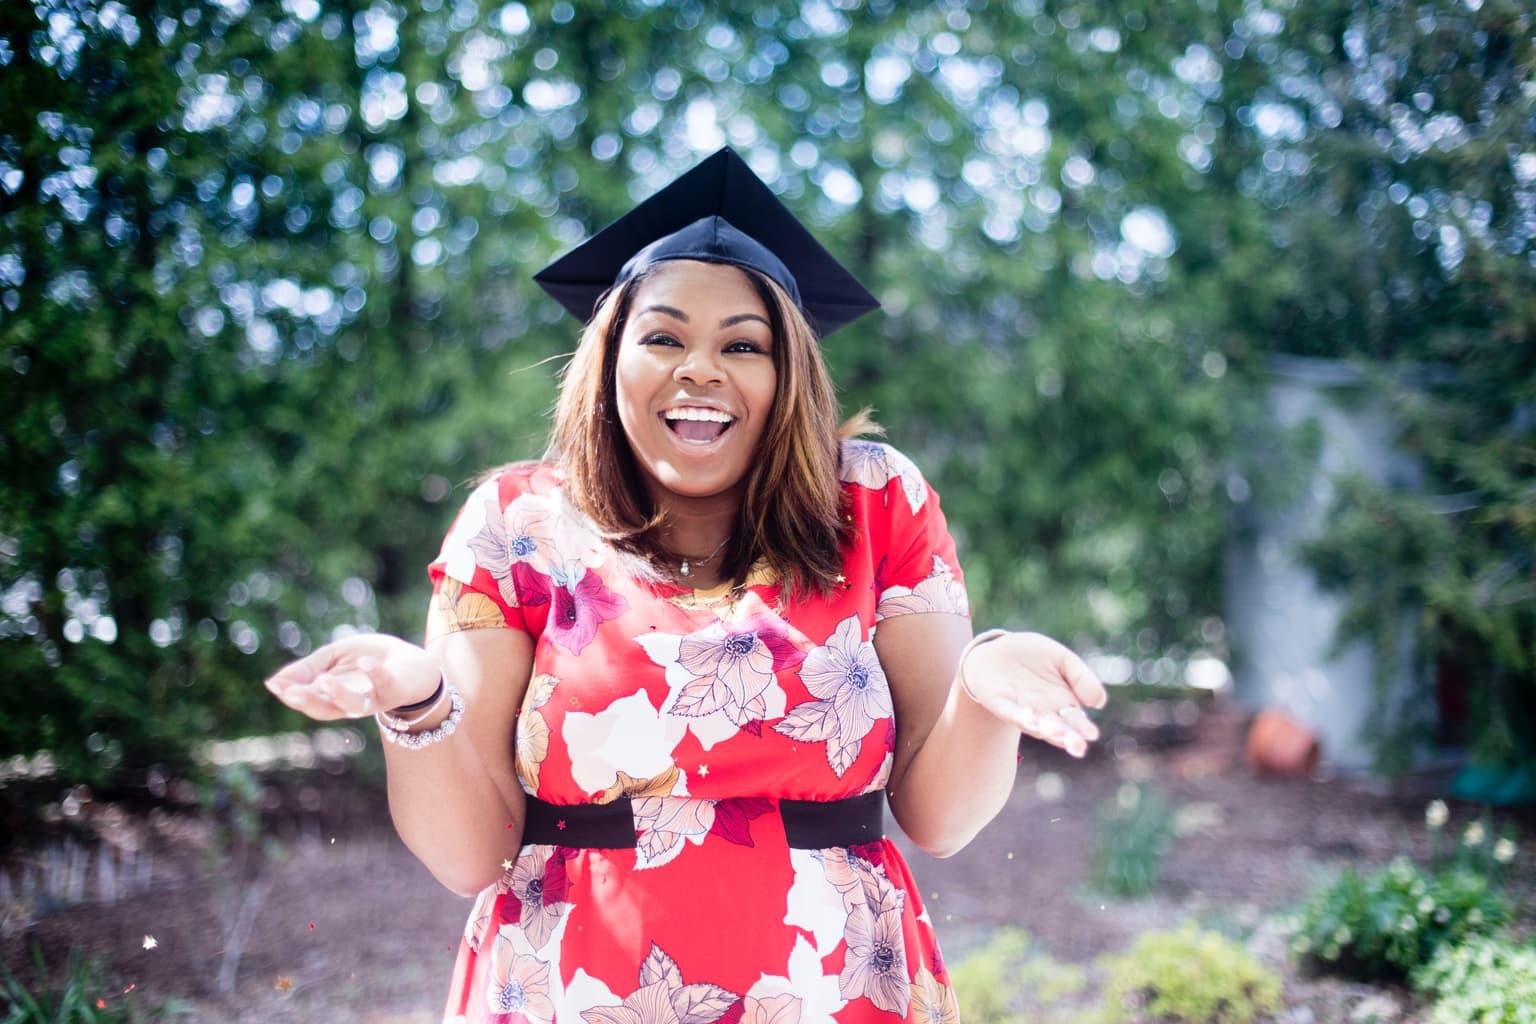 graduation-day-looks-4